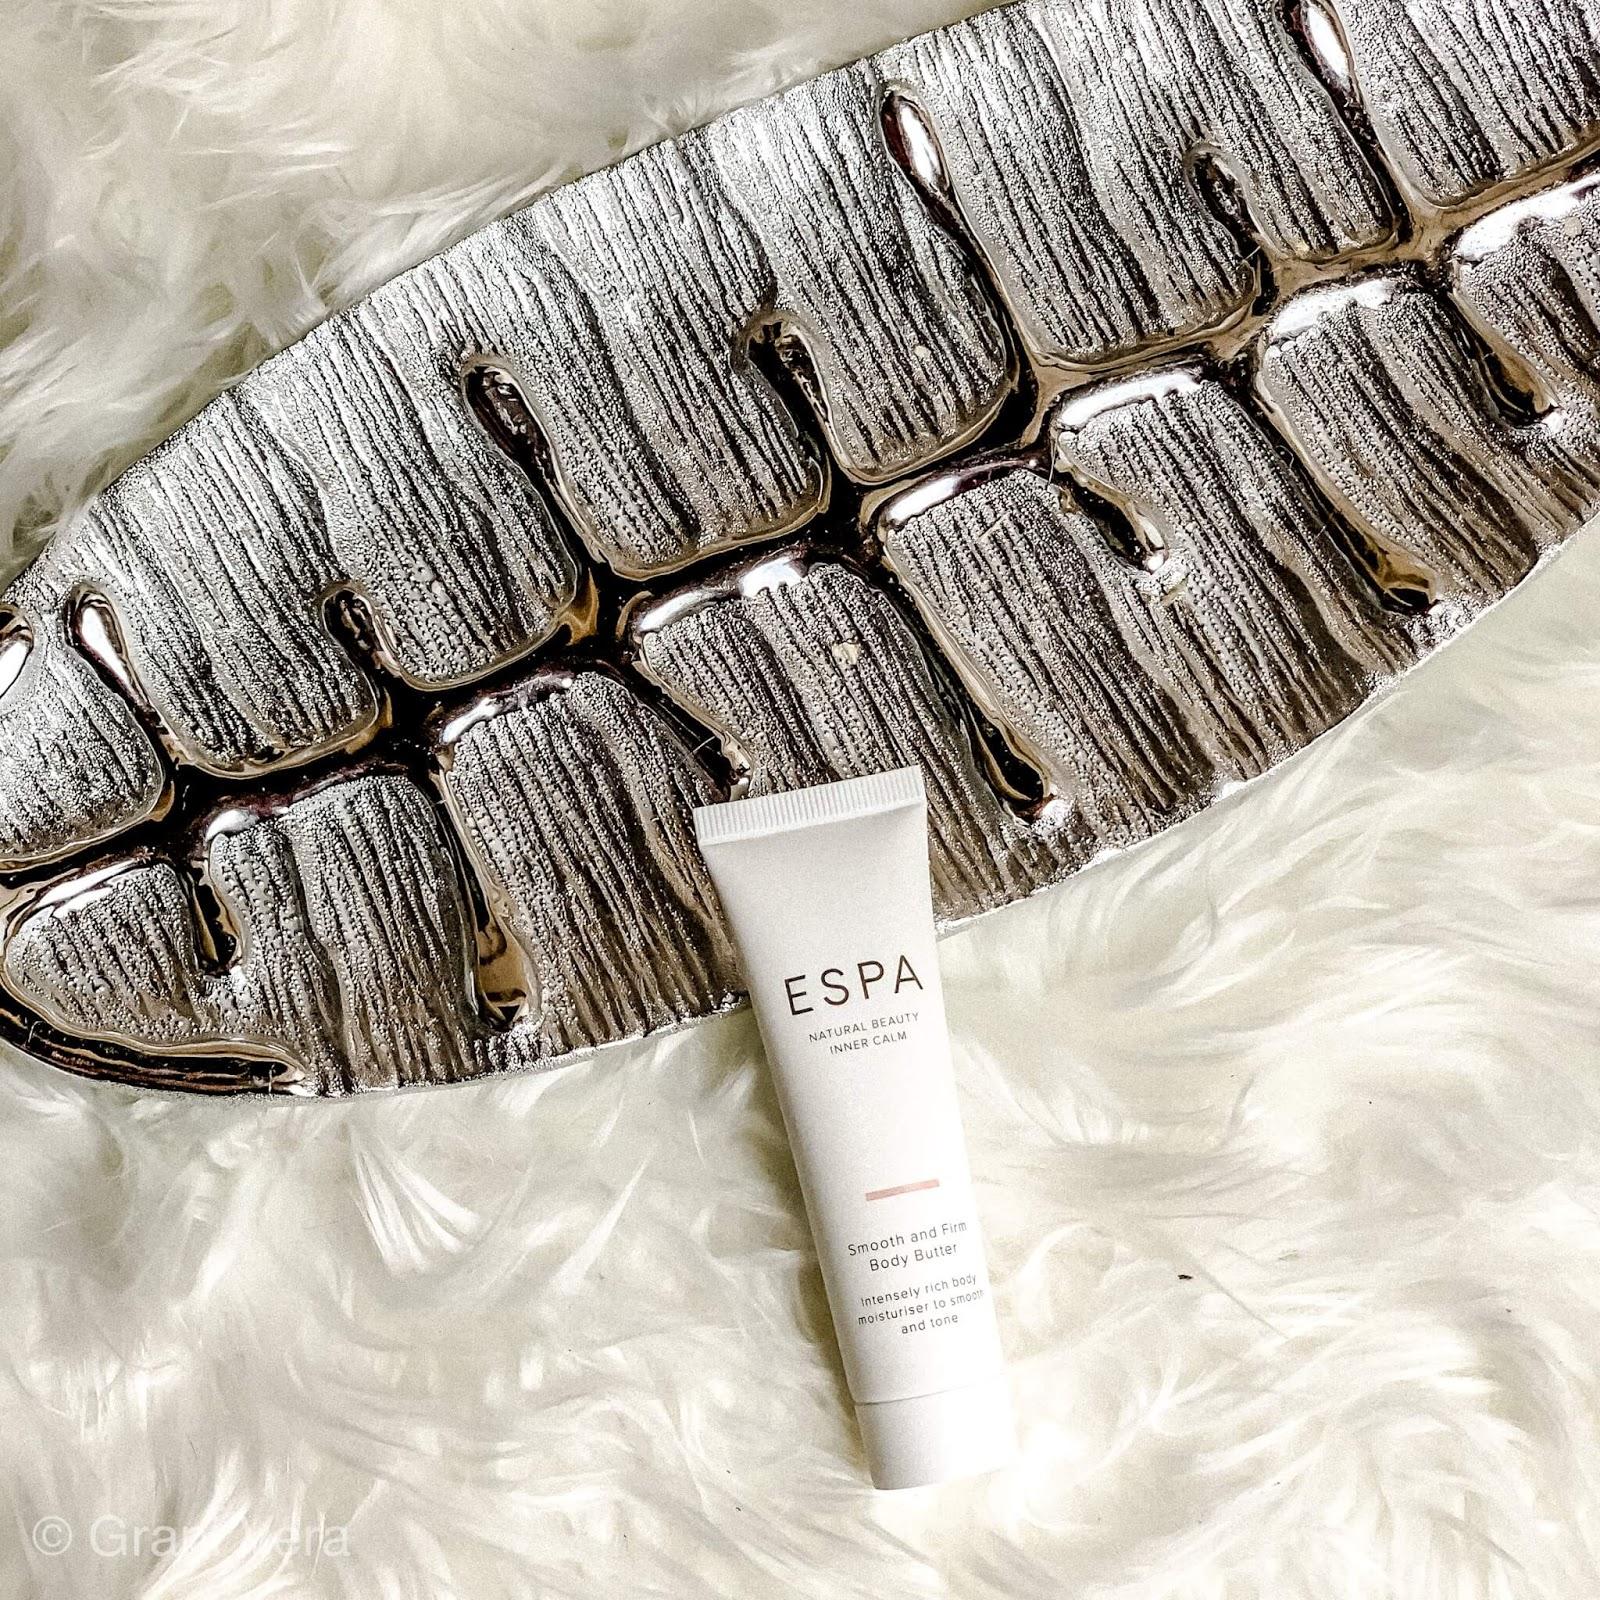 Espa-body-butter